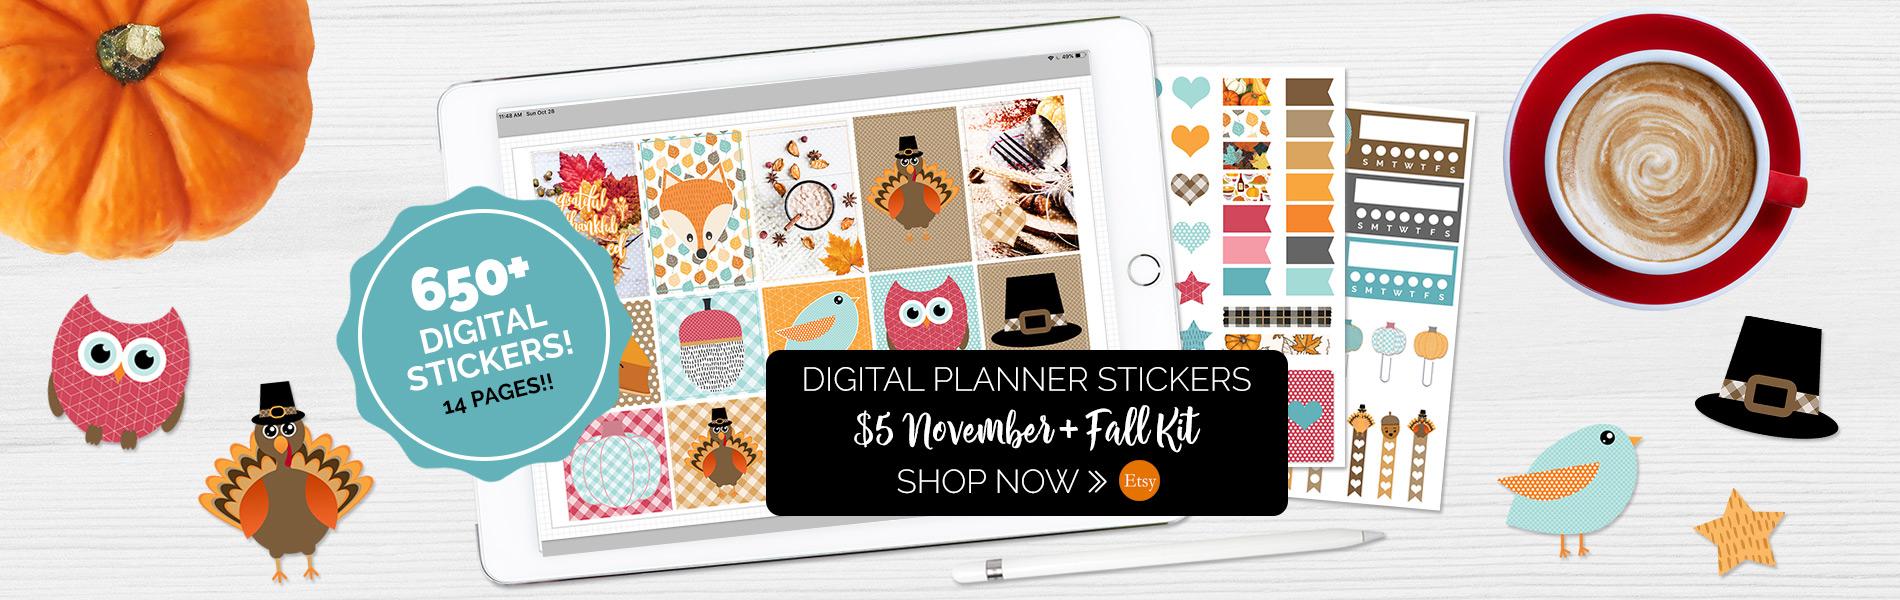 November Digital Planner Sticker Set | @DigiPlannerCentral